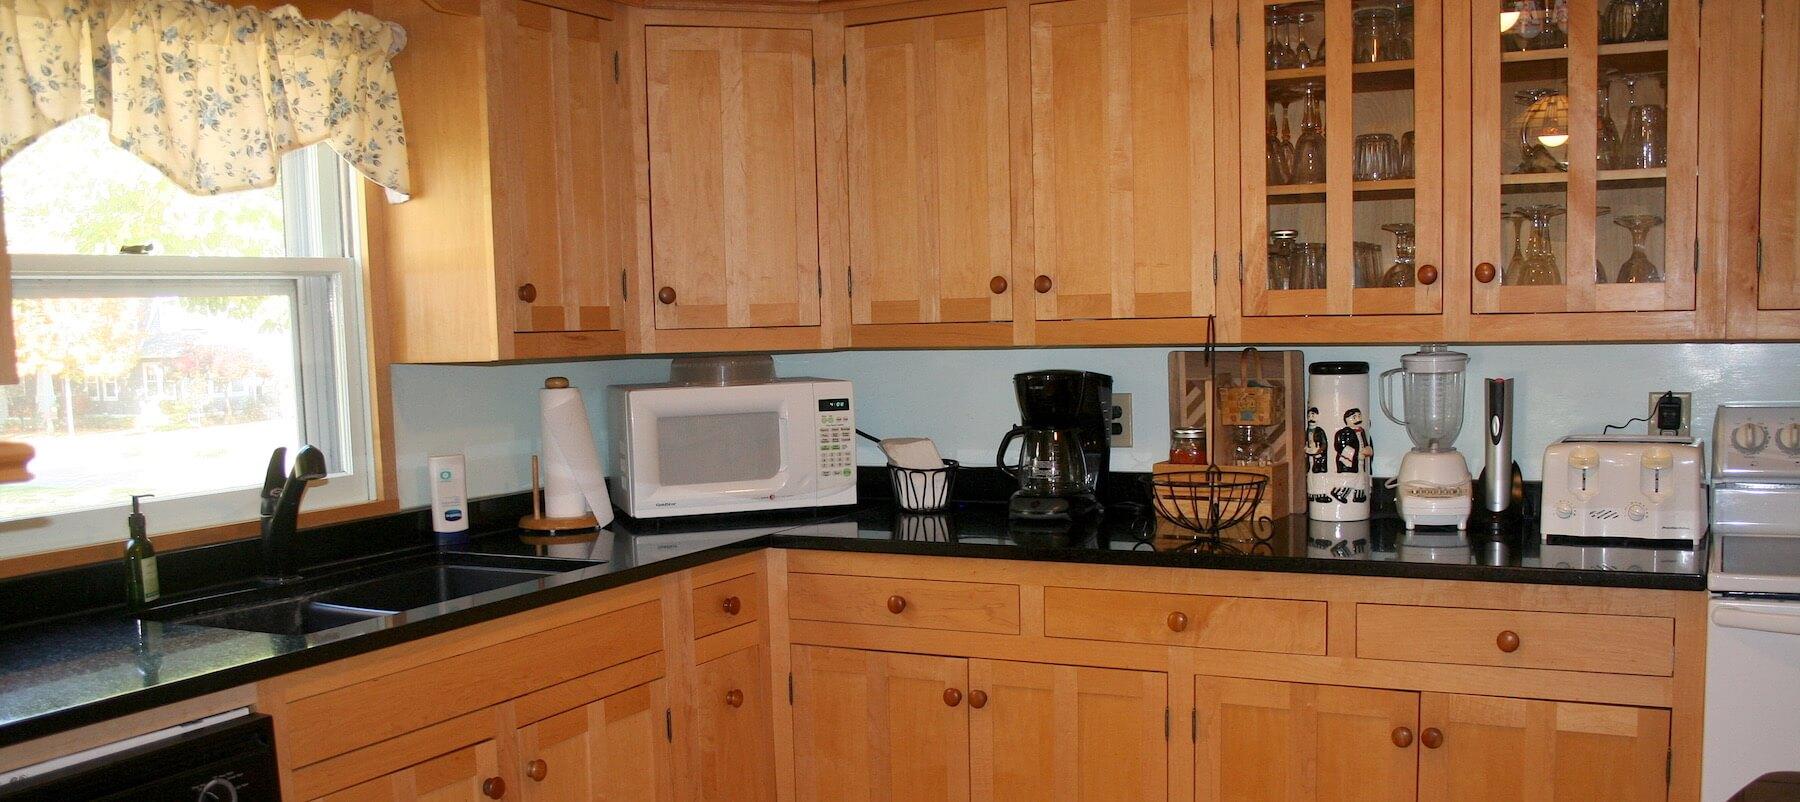 Custom Quality for Less & Custom Cabinets Made to Your Specifications | Steve\u0027s Custom Cabinets kurilladesign.com